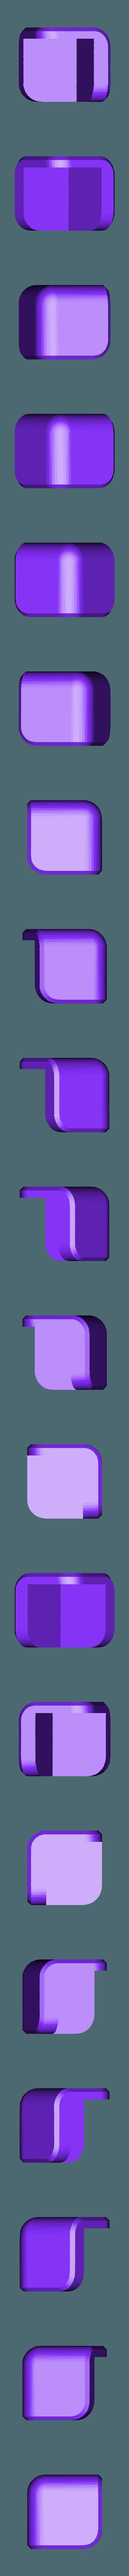 baby safety corner.STL Download free STL file Safety corner • 3D printer model, Platridi